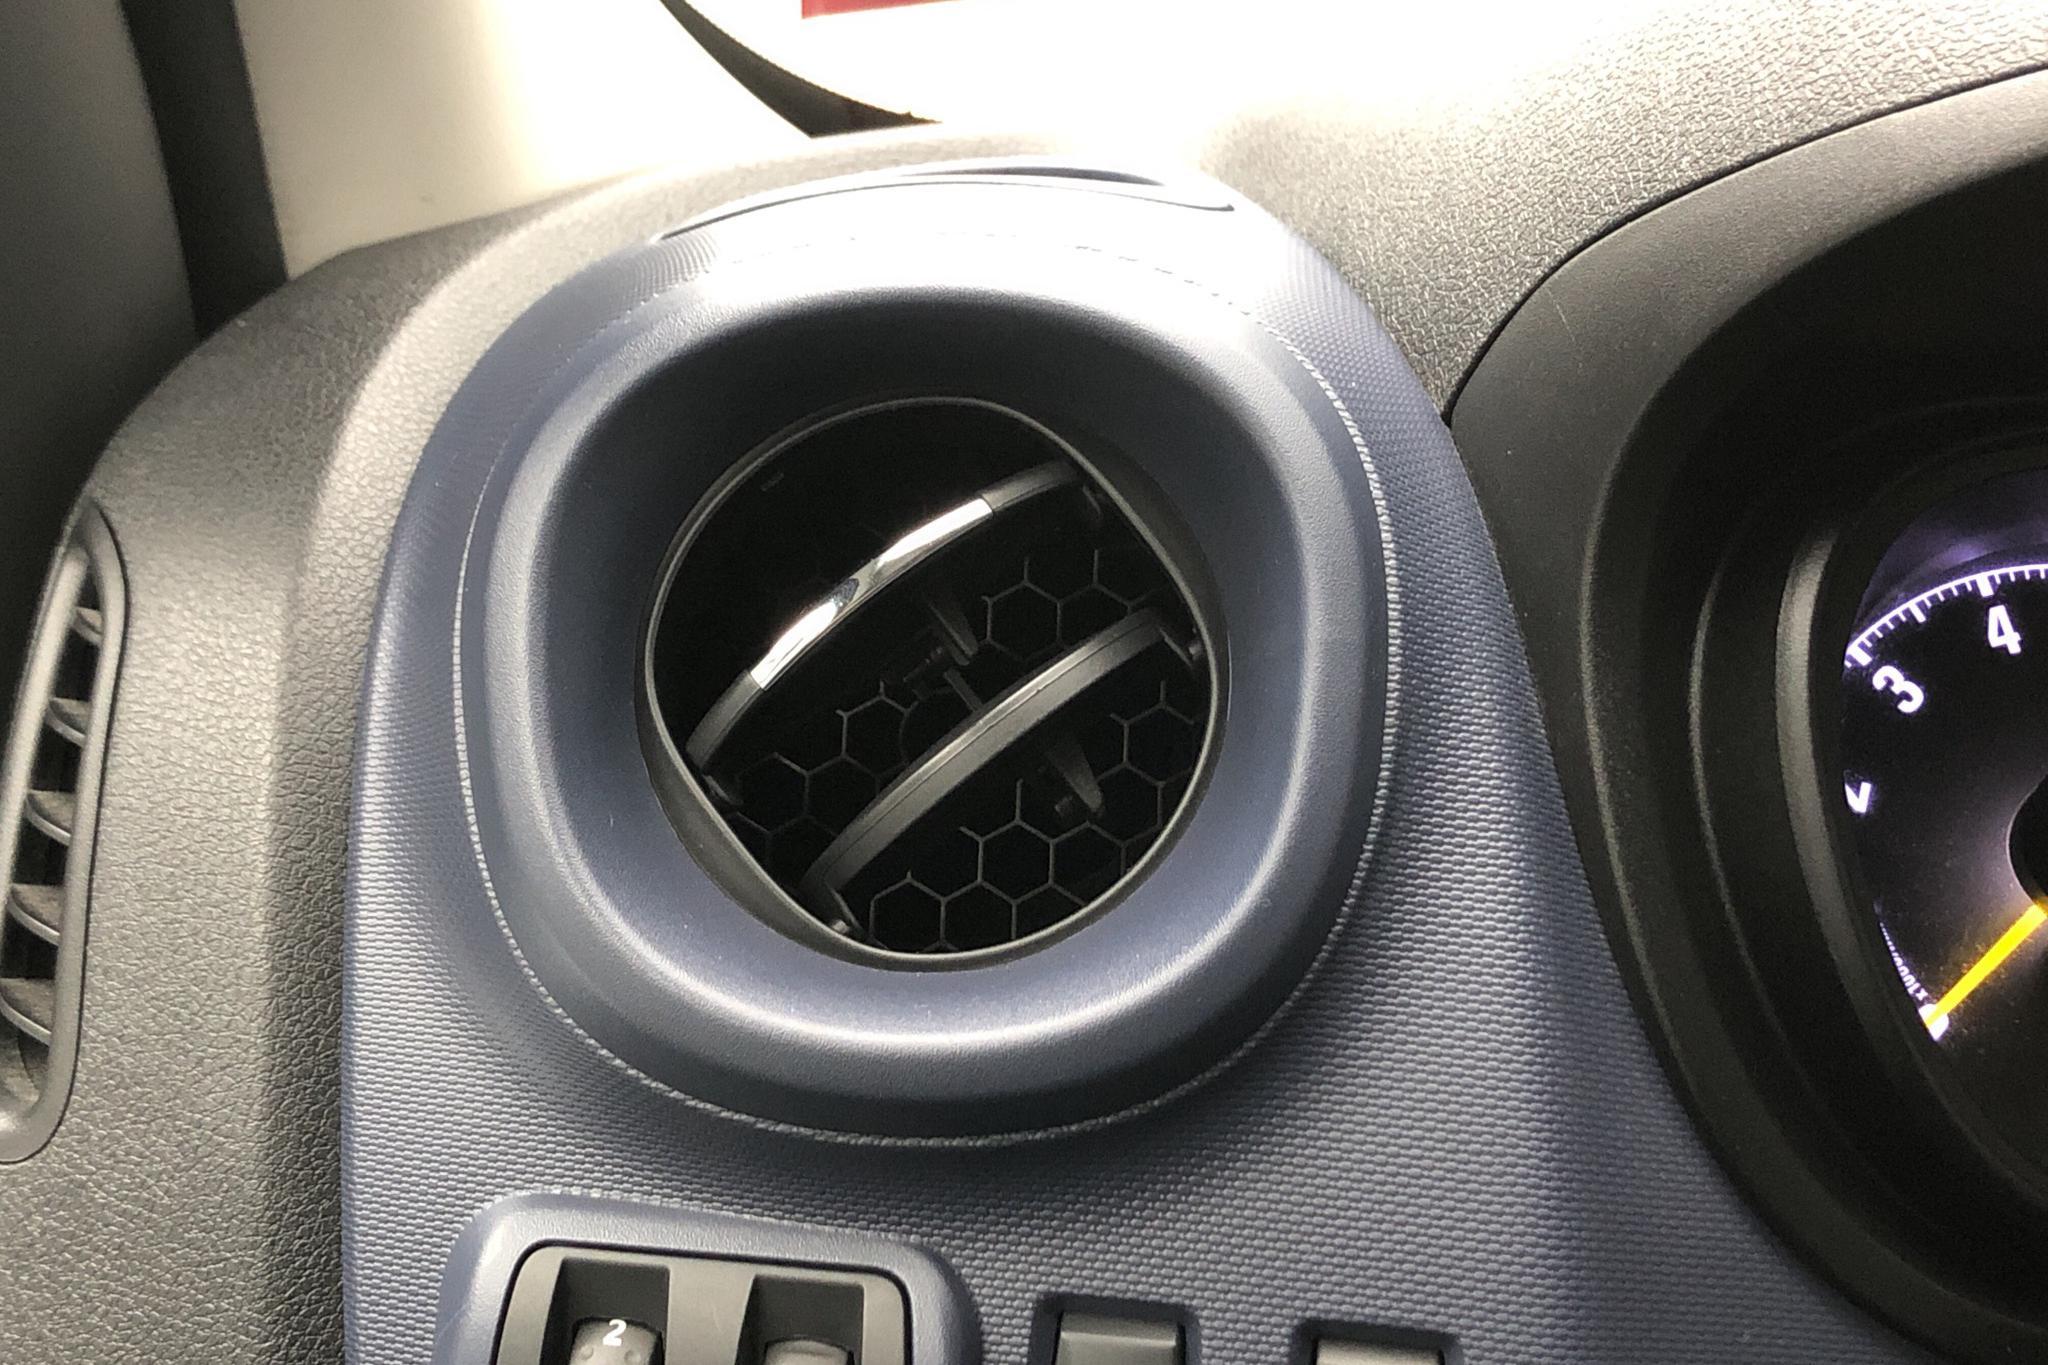 Opel Vivaro 1.6 CDTI (120hk) - 147 710 km - Manual - black - 2015